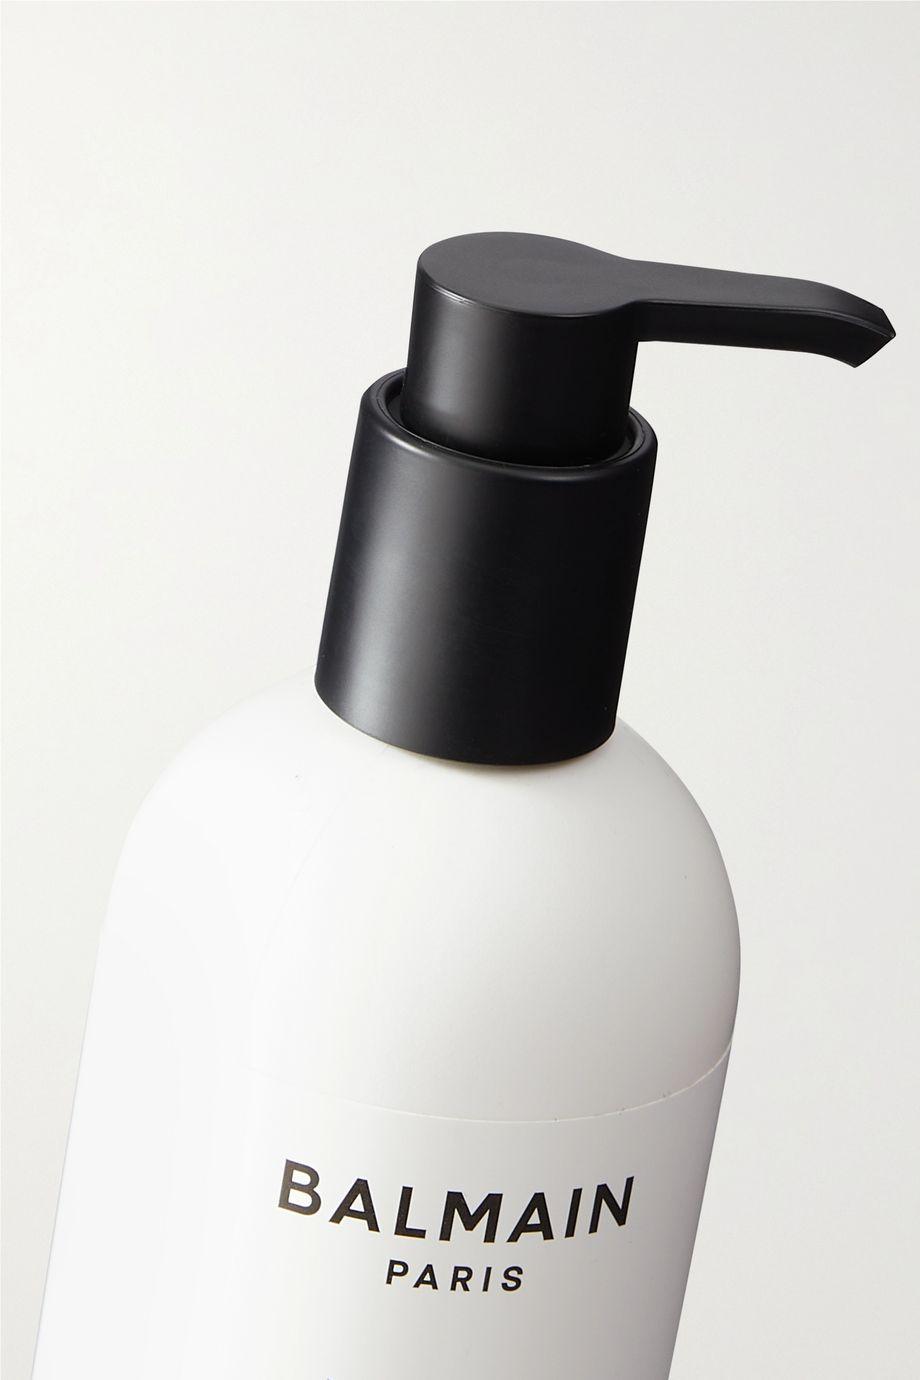 Balmain Paris Hair Couture Moisturizing Conditioner, 300ml